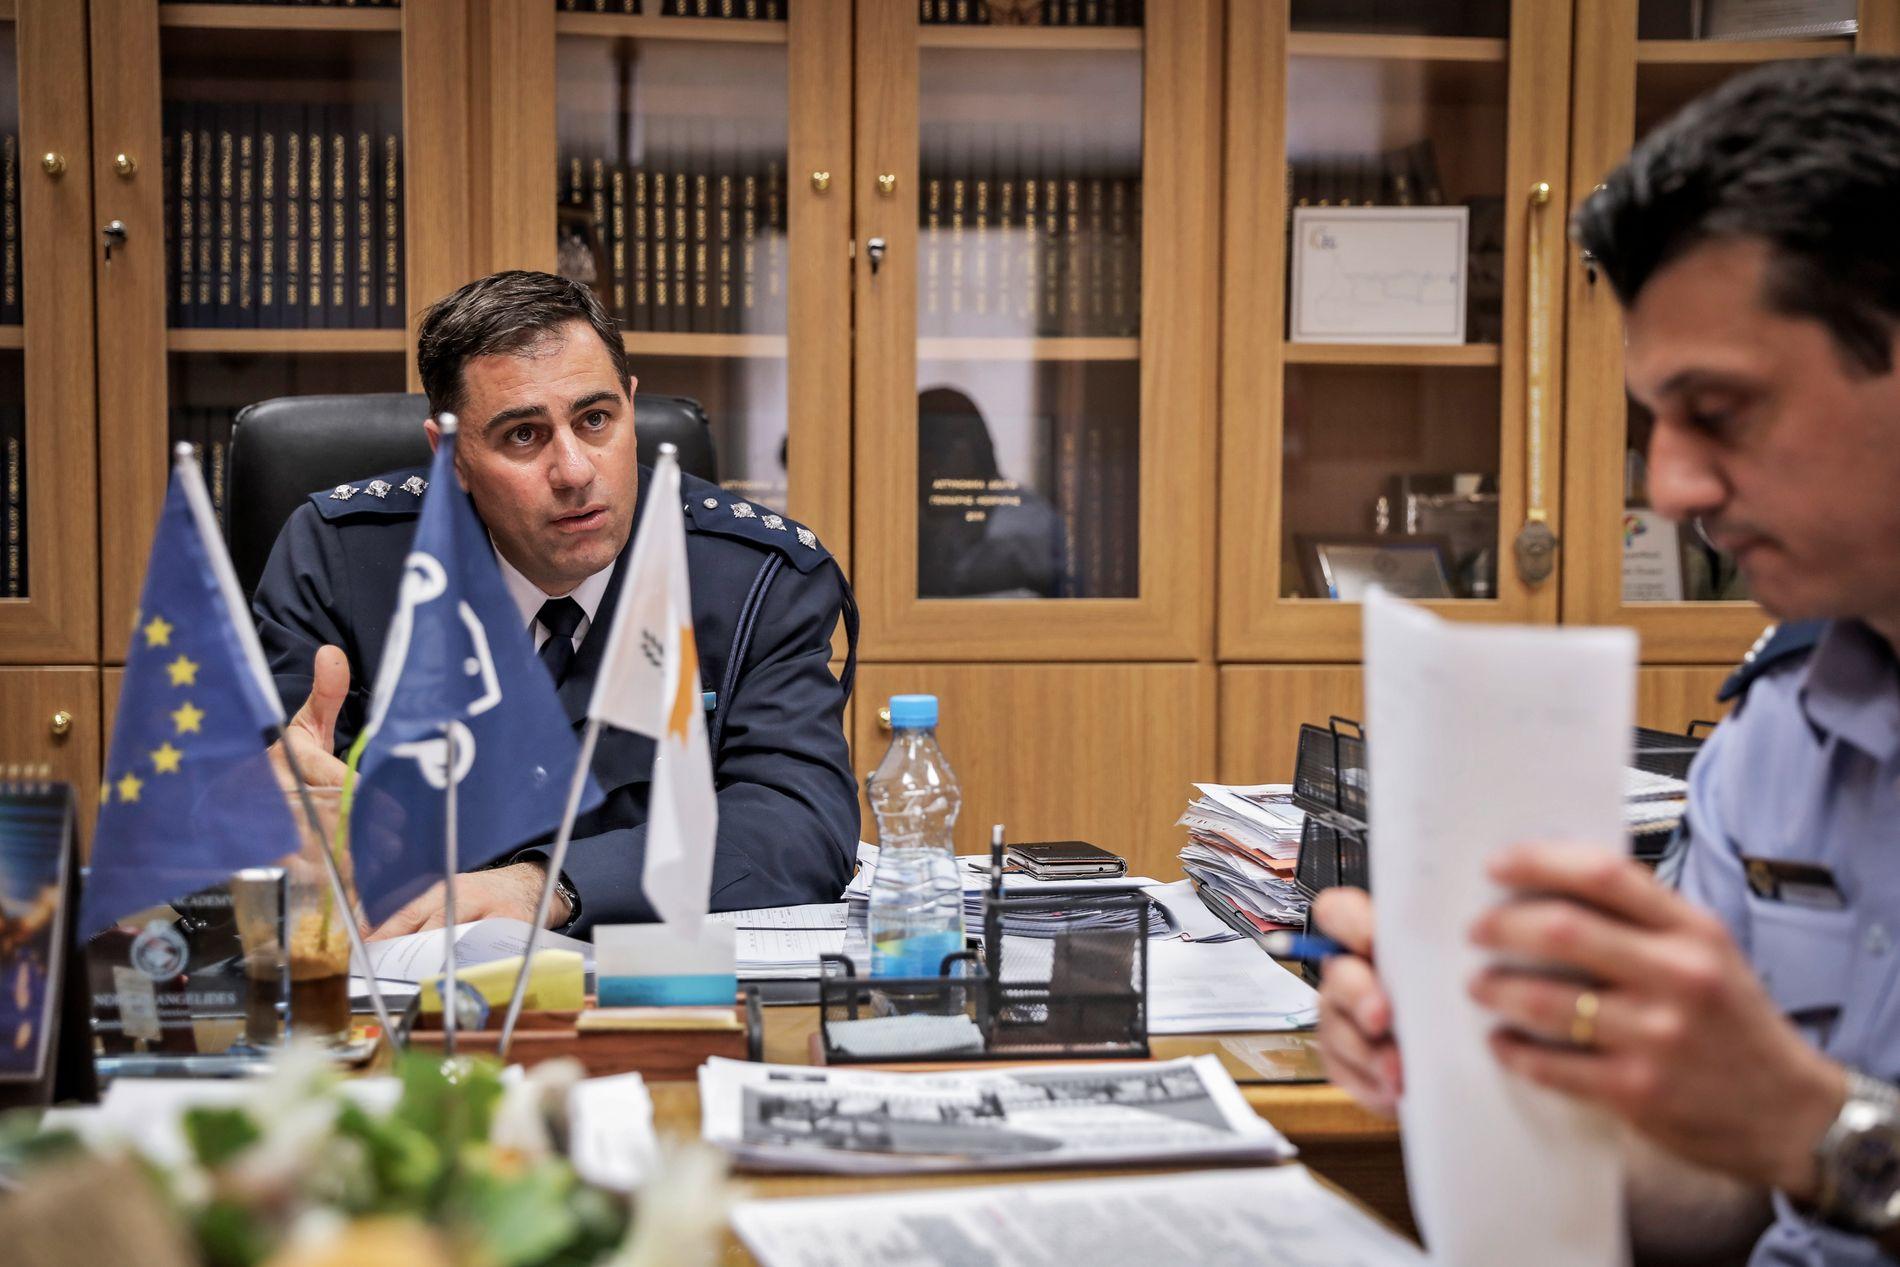 VRIEN SAK: Sjefinspektør Andreas Angelides og talsmann Stelios Stylianou treffer VG ved politihovedkvarteret i Nikosia.